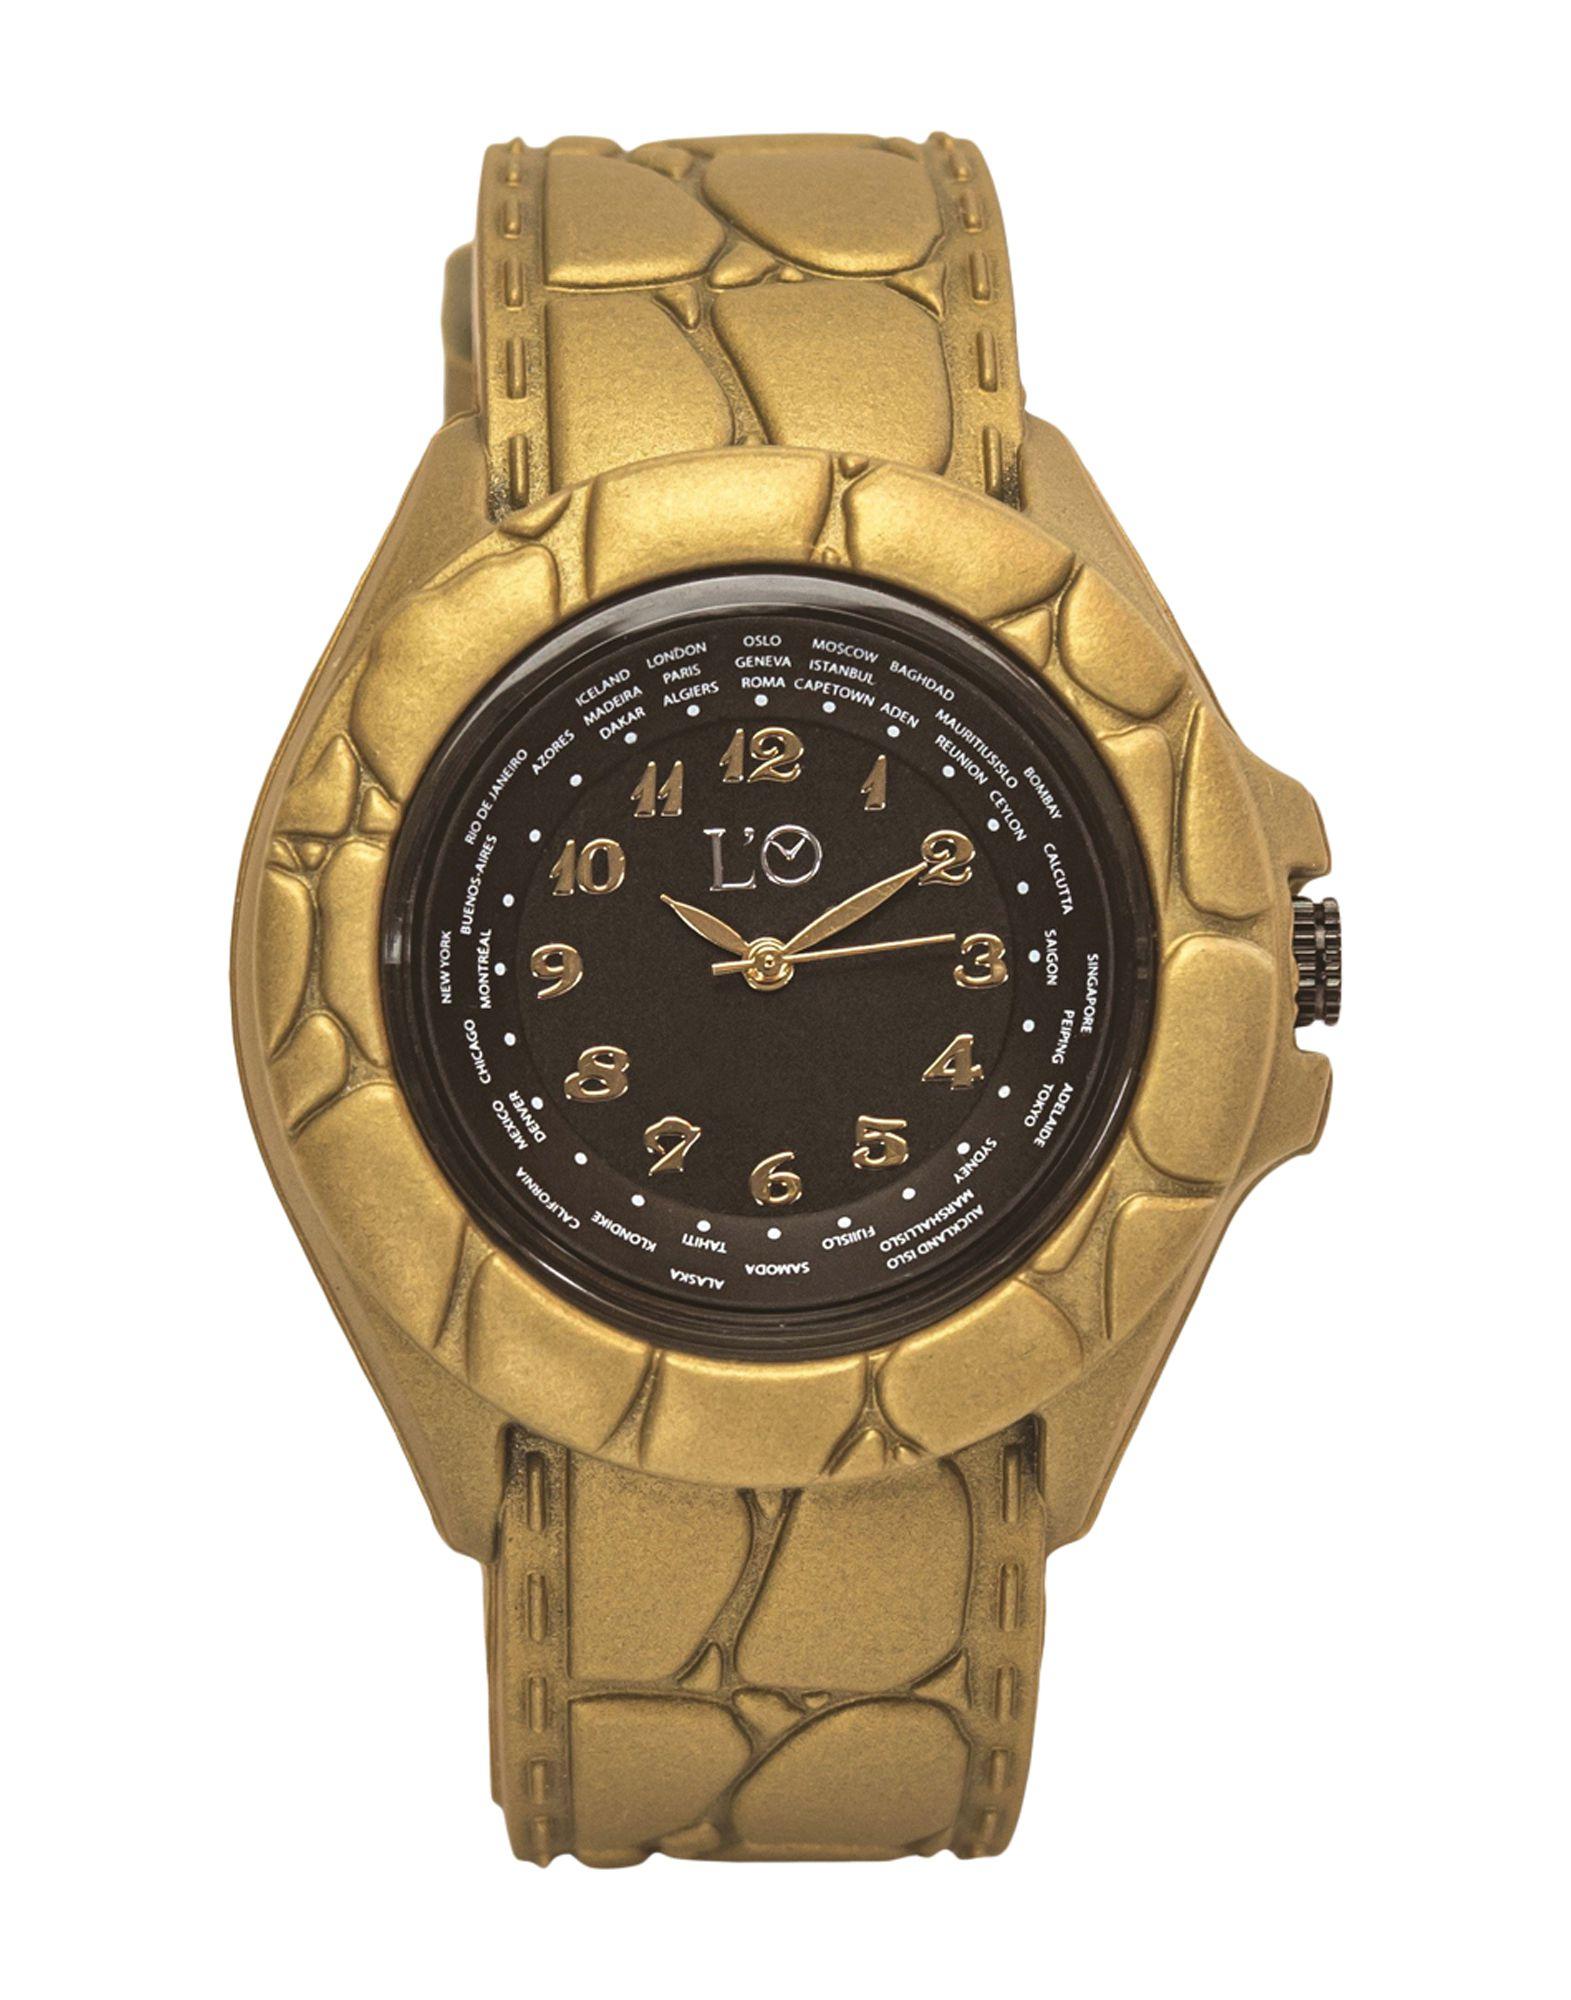 L'O WATCH Наручные часы free shipping 1pc original 8200 balance regulating tool for watch repair